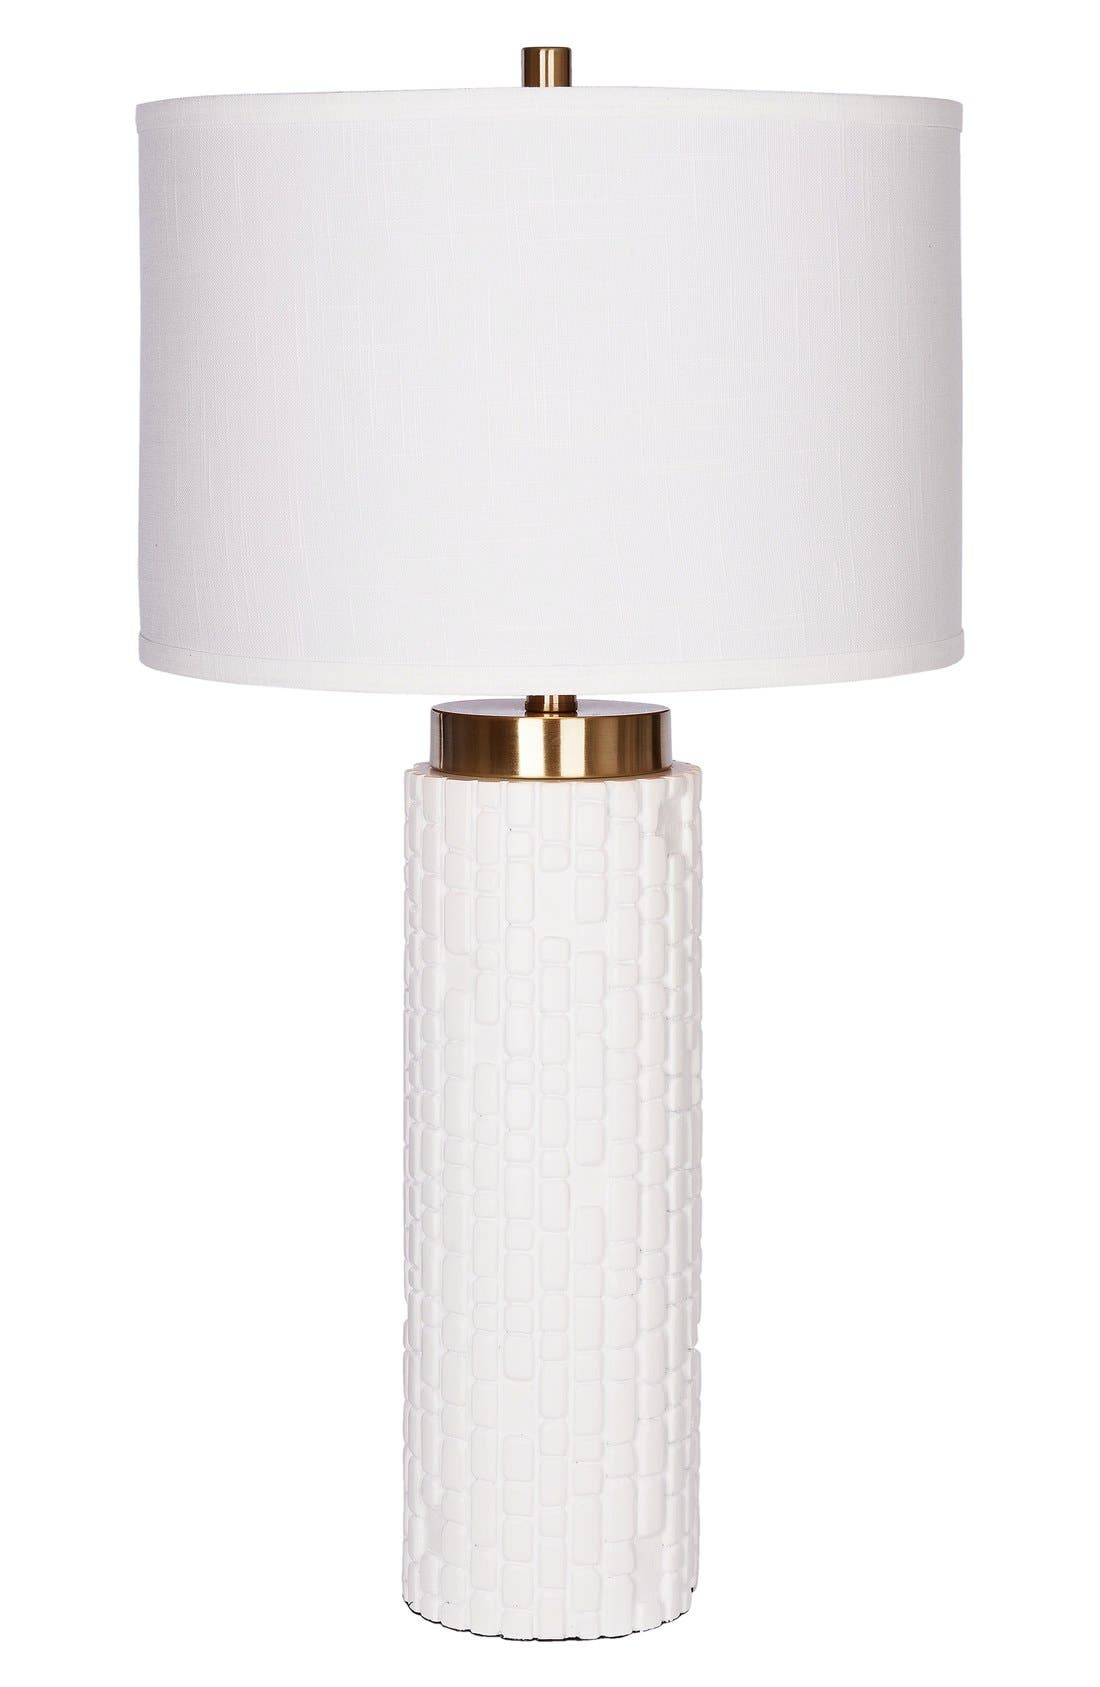 JAlexander Mya Cylinder Table Lamp,                             Main thumbnail 1, color,                             WHITE